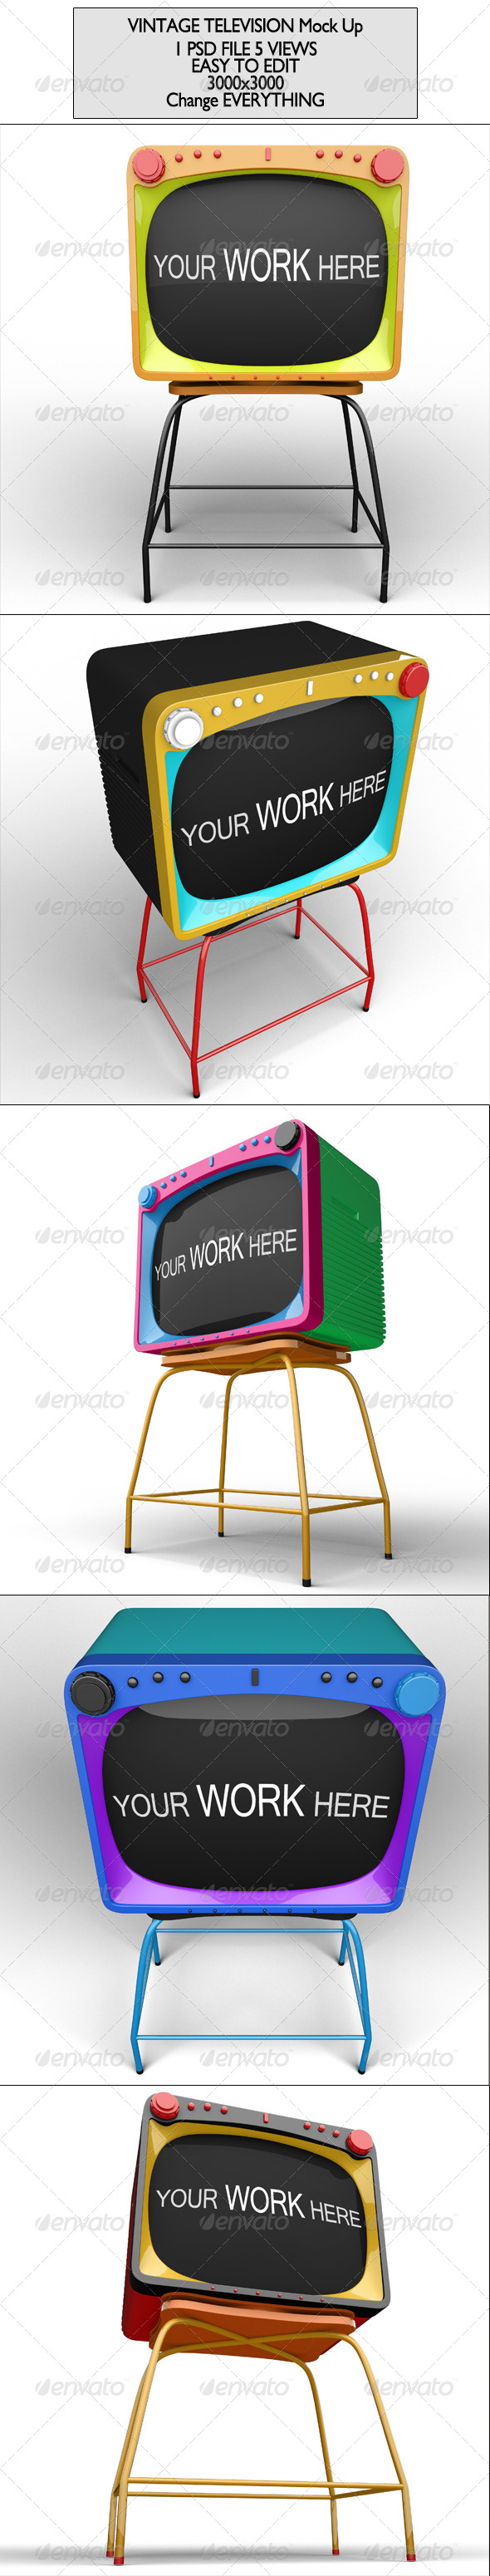 Vintage Television Mock Up - Product Mock-Ups Graphics